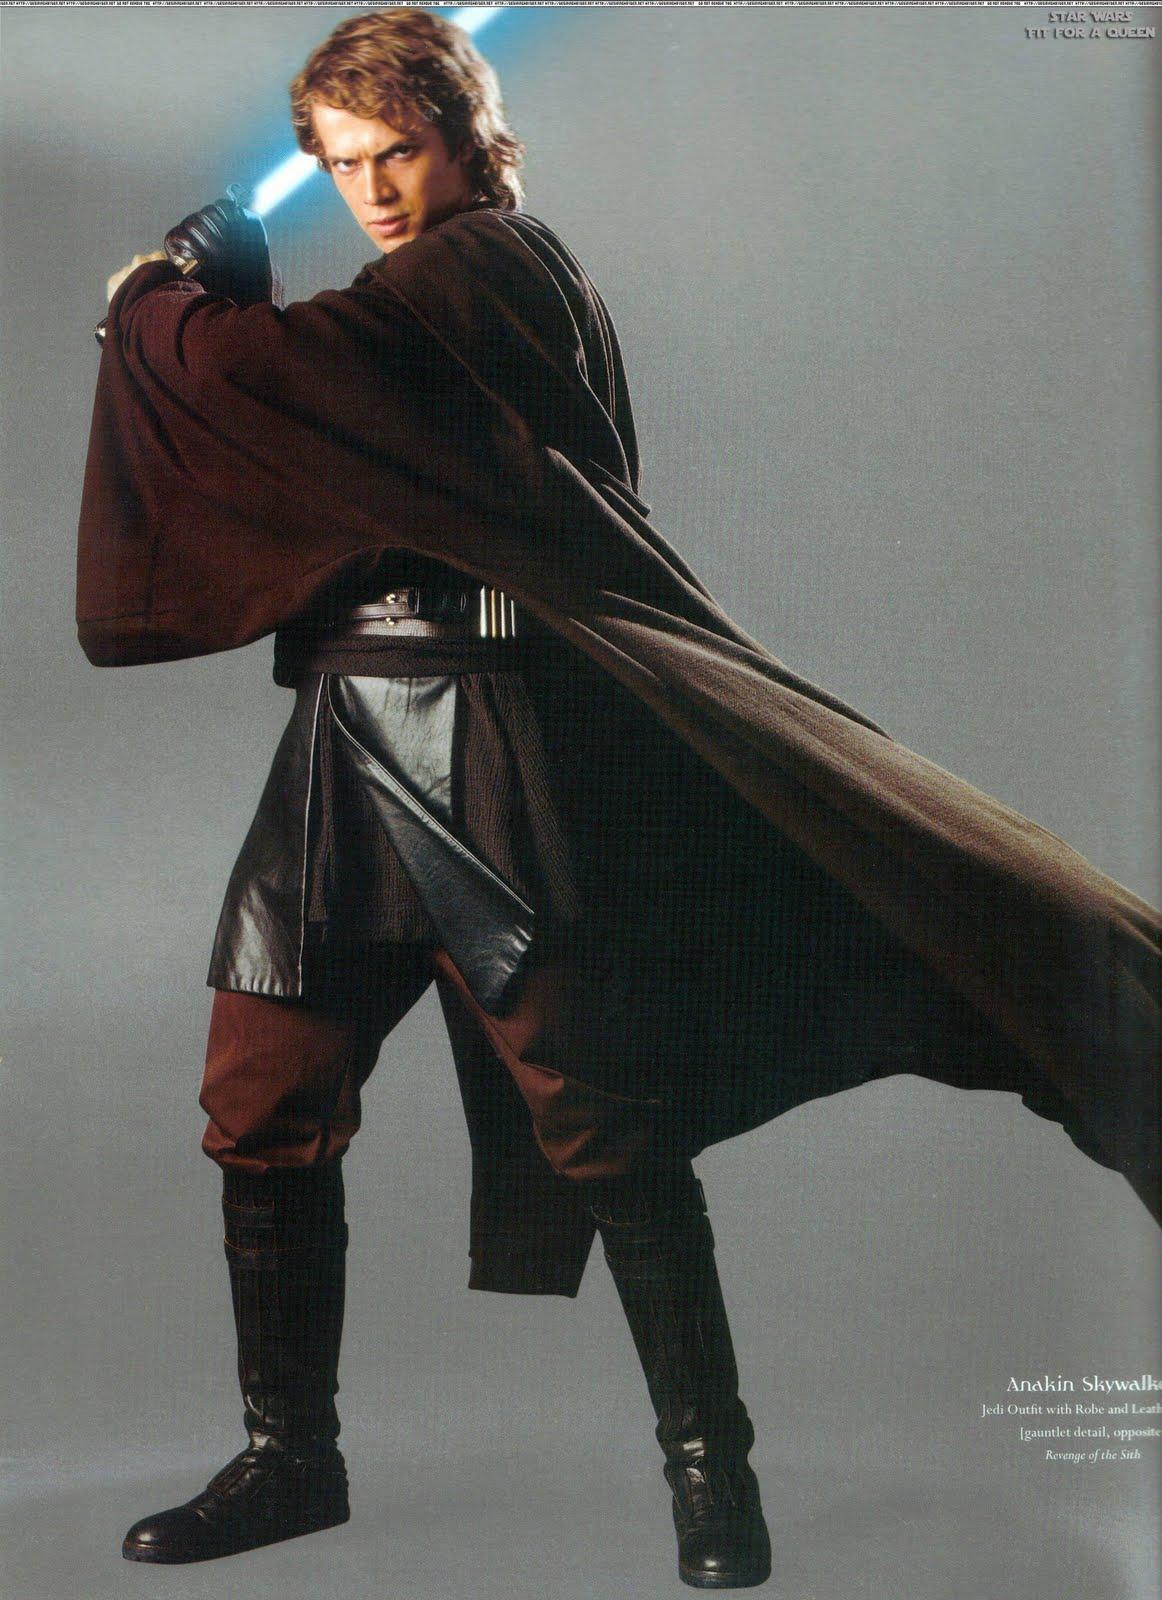 49+ Star Wars Wallpaper Anakin on WallpaperSafari